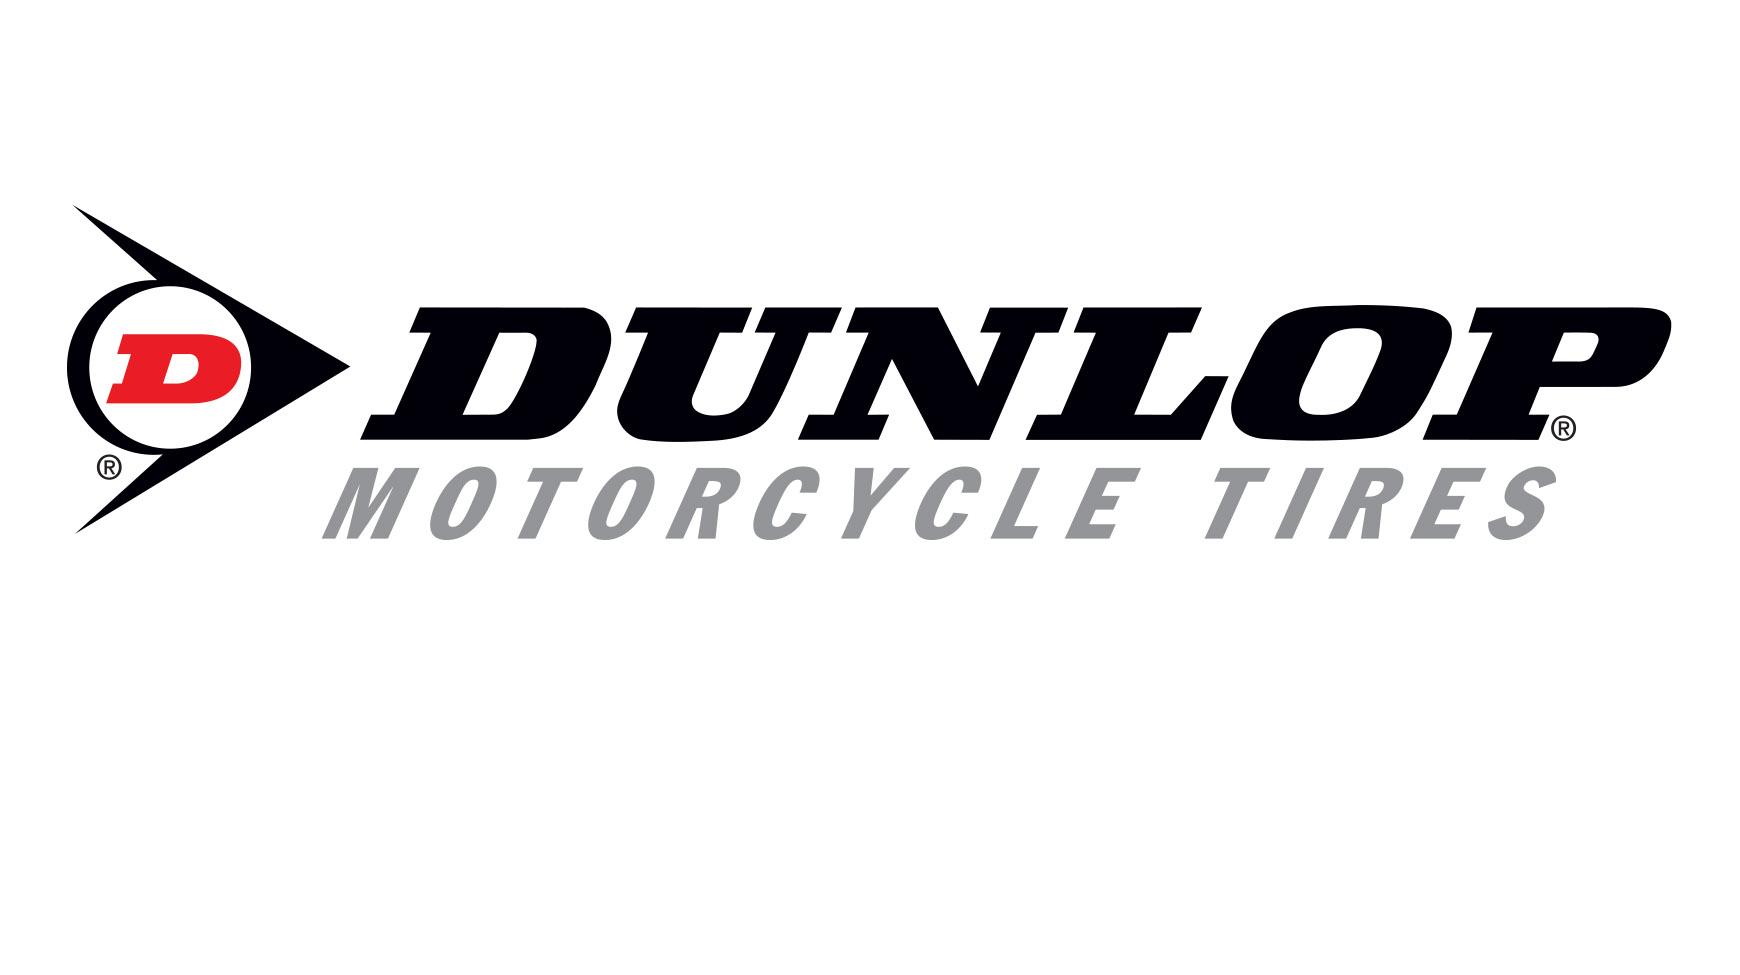 DLogo_MotorcycleTires_Rotator-0